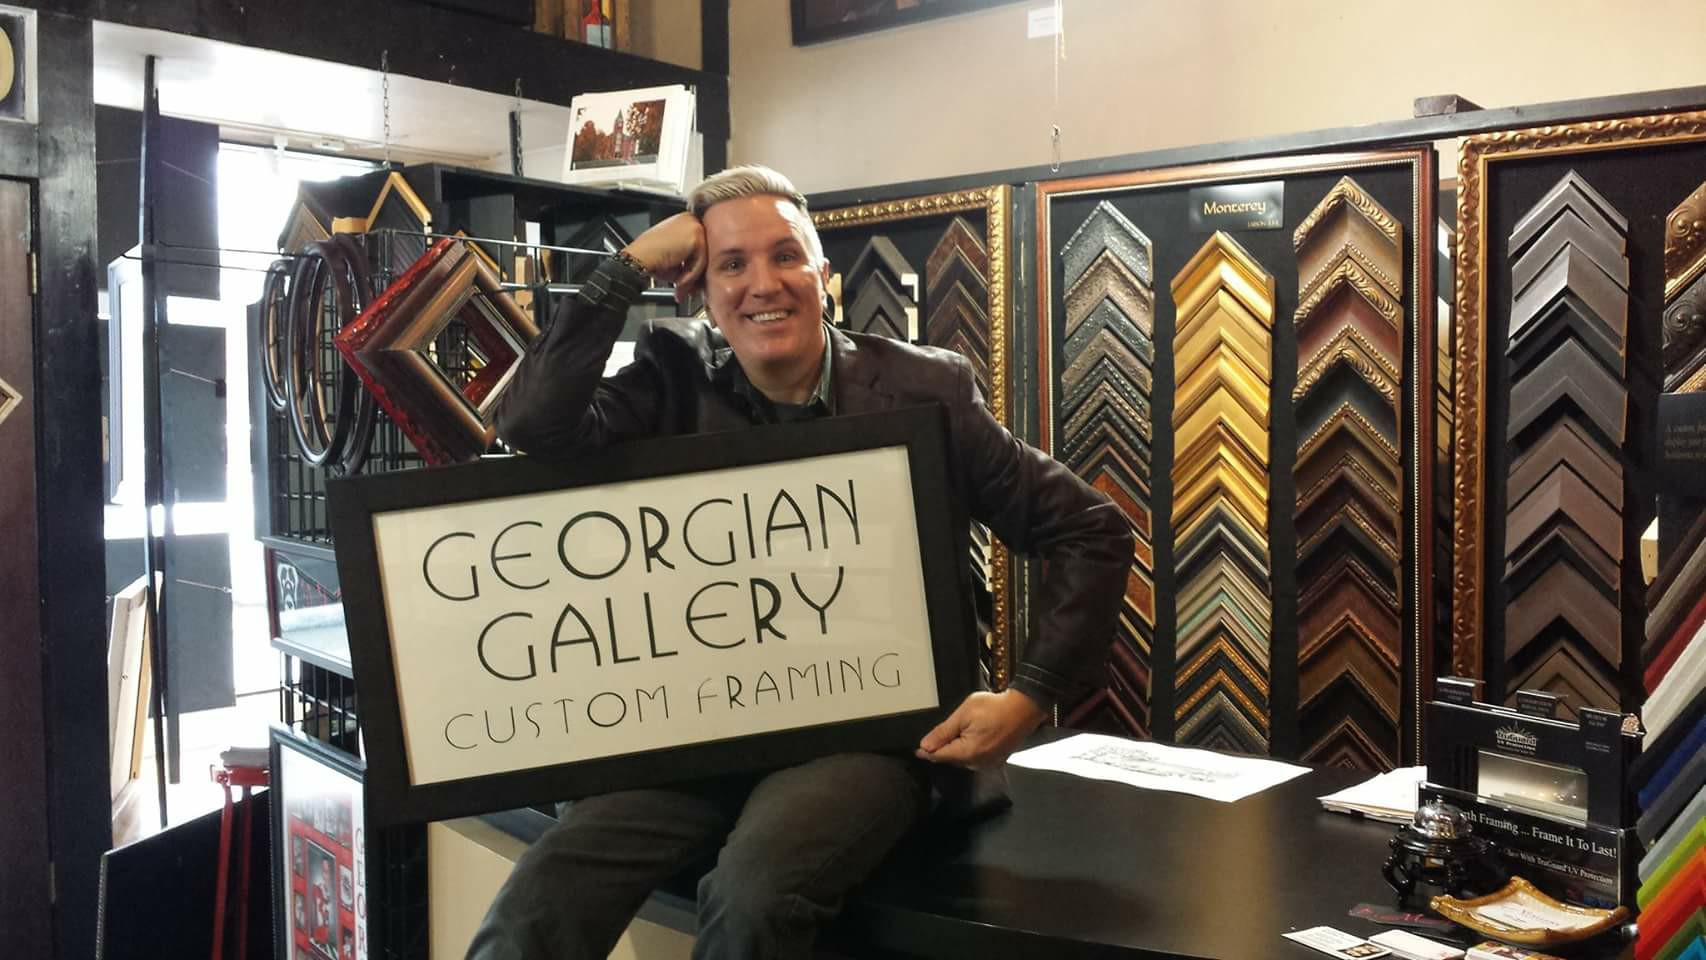 Georgian Gallery Custom Framing